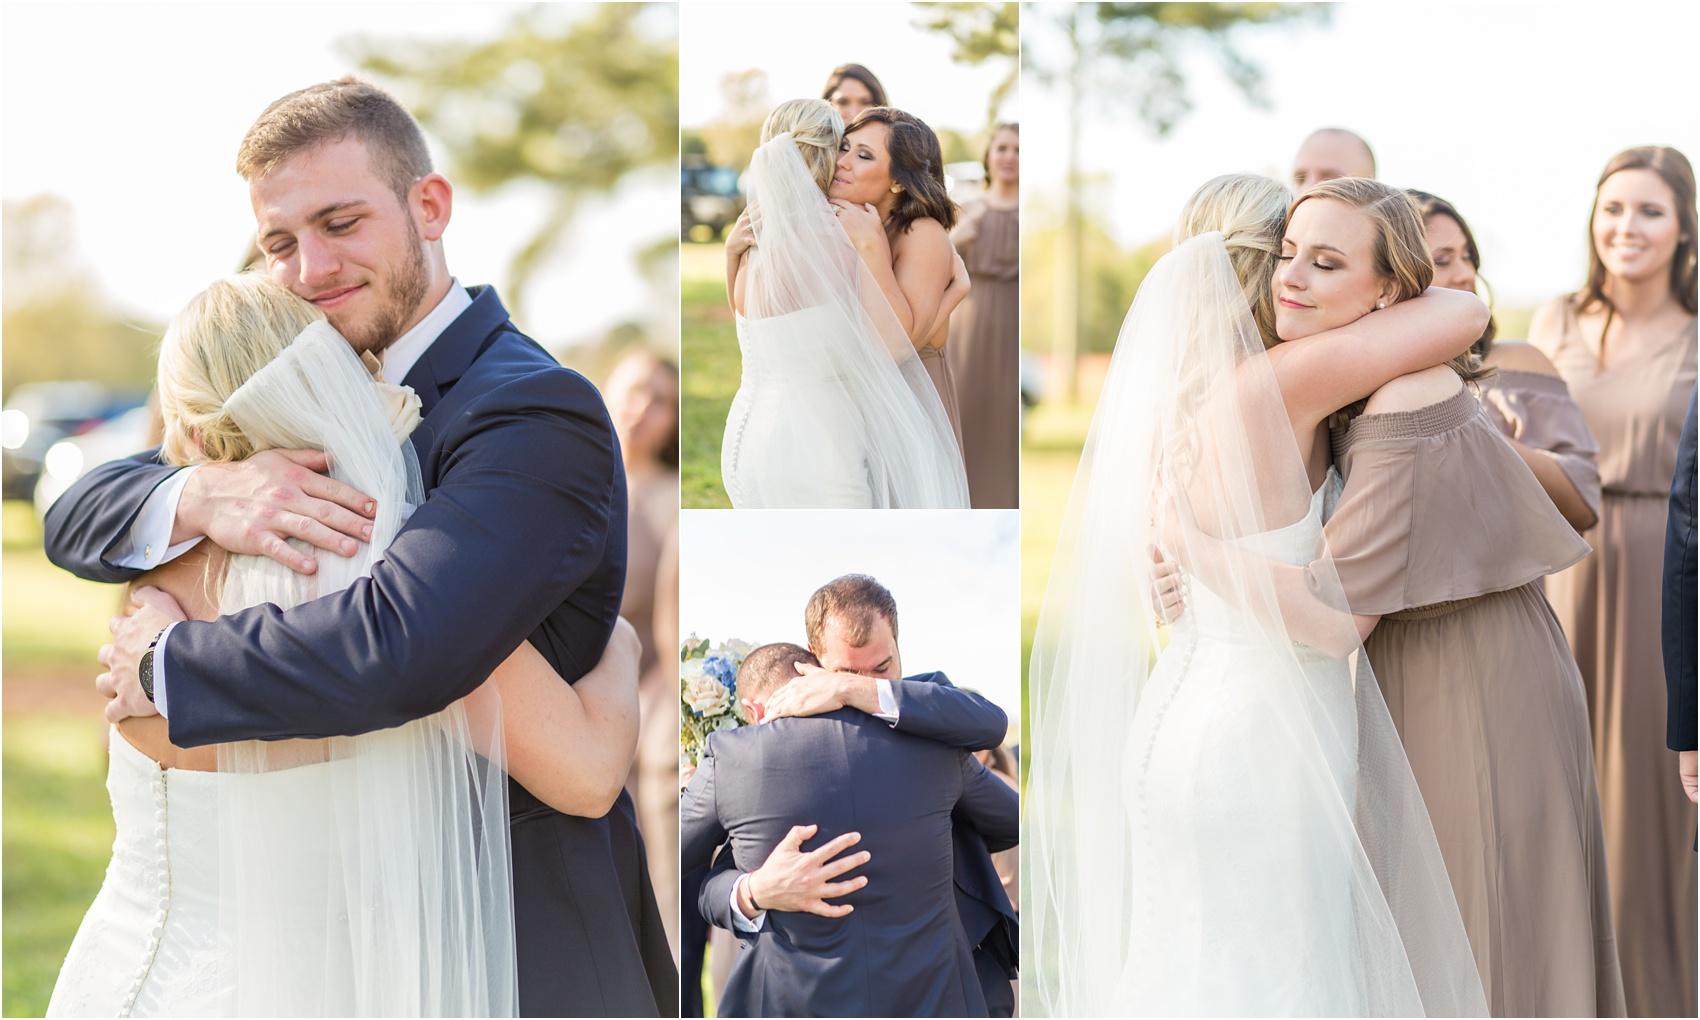 Savannah Eve Photography- Wade Wedding-52.jpg